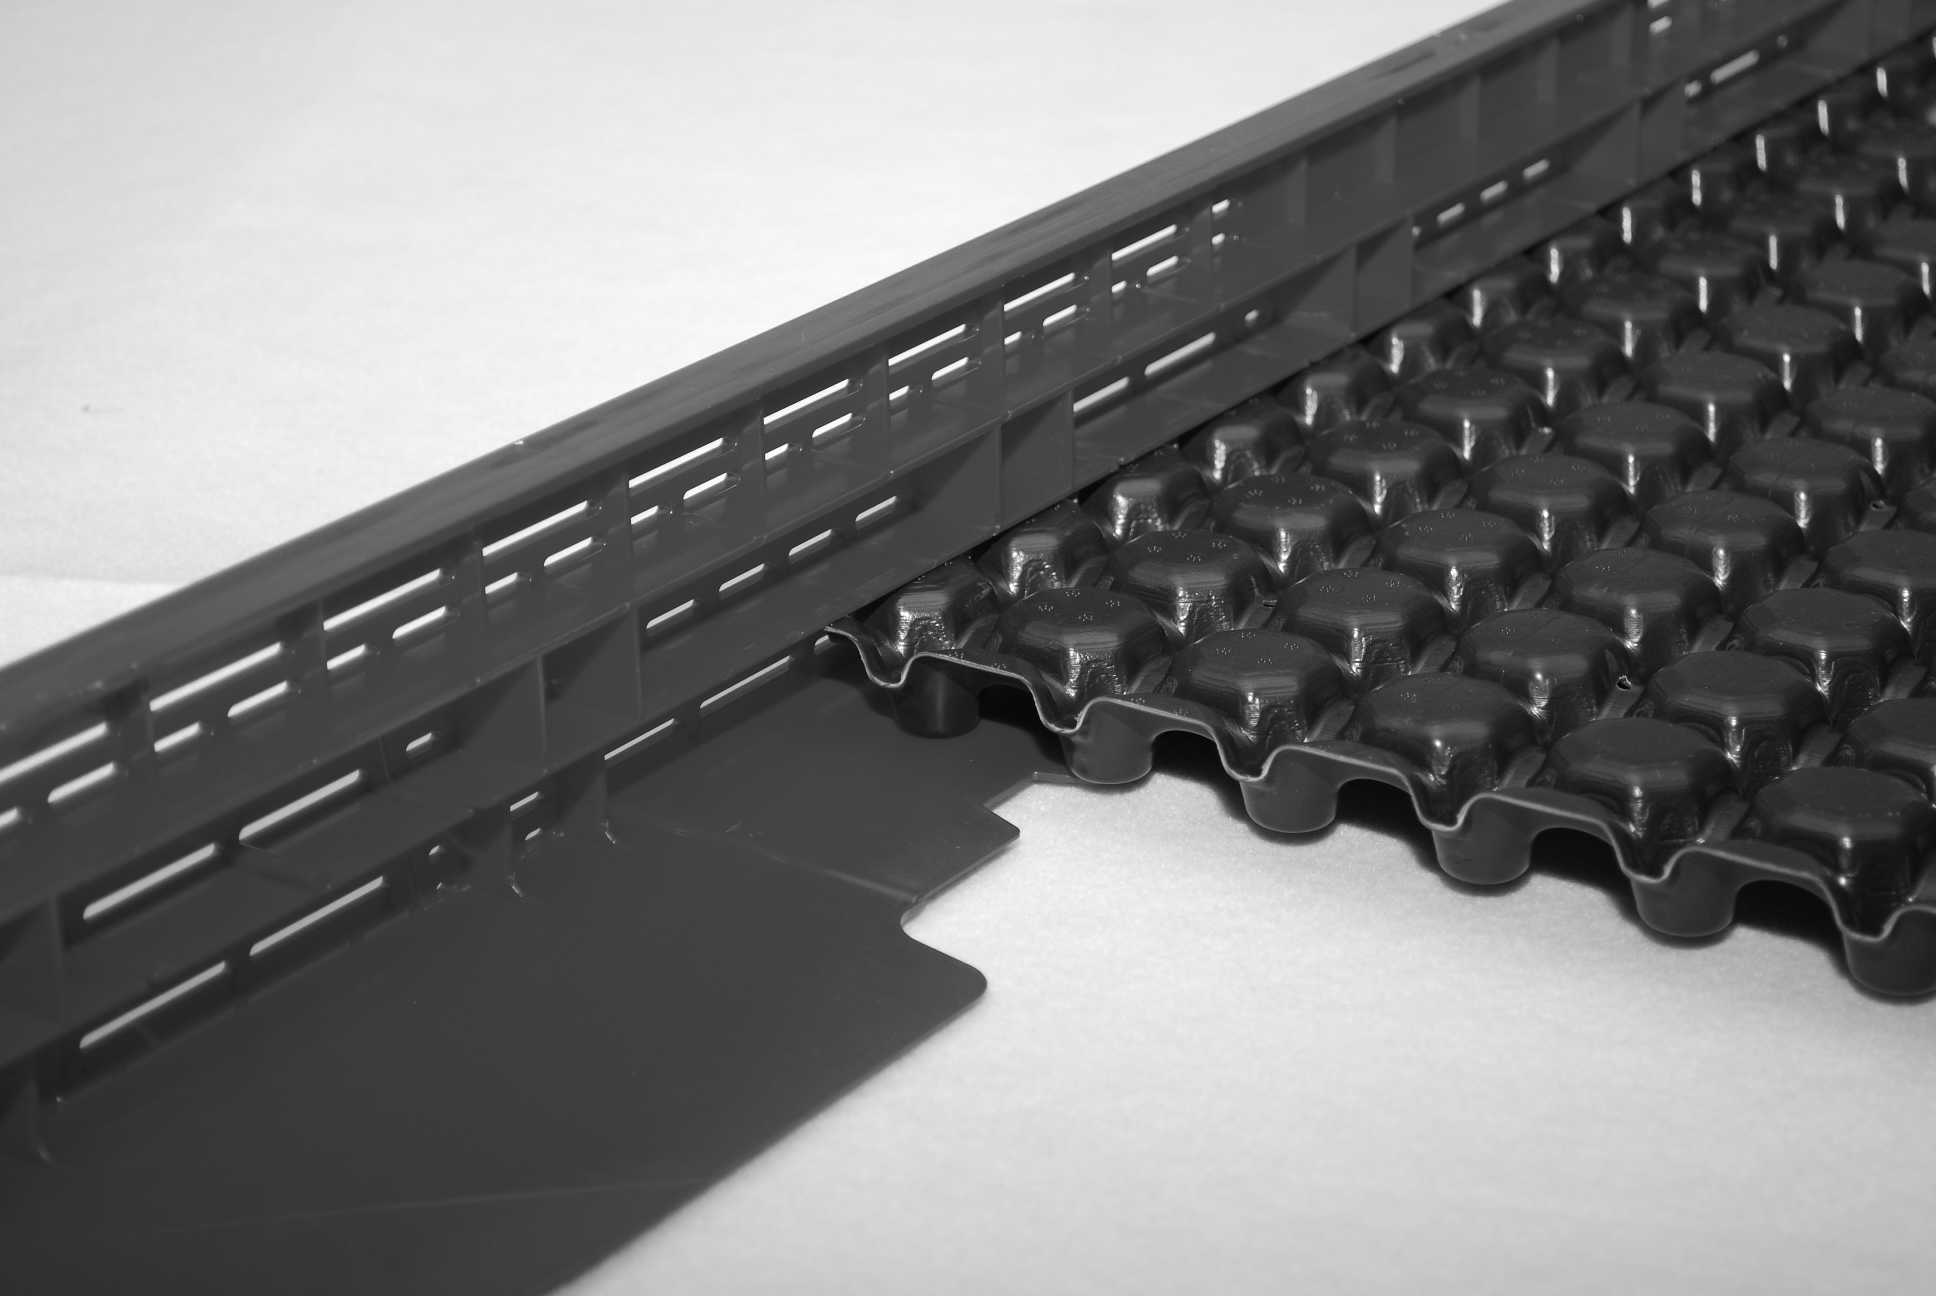 optigr n system kiesleiste skl 120 1100 zubeh r produkte dachbegr nung gr ndach material. Black Bedroom Furniture Sets. Home Design Ideas